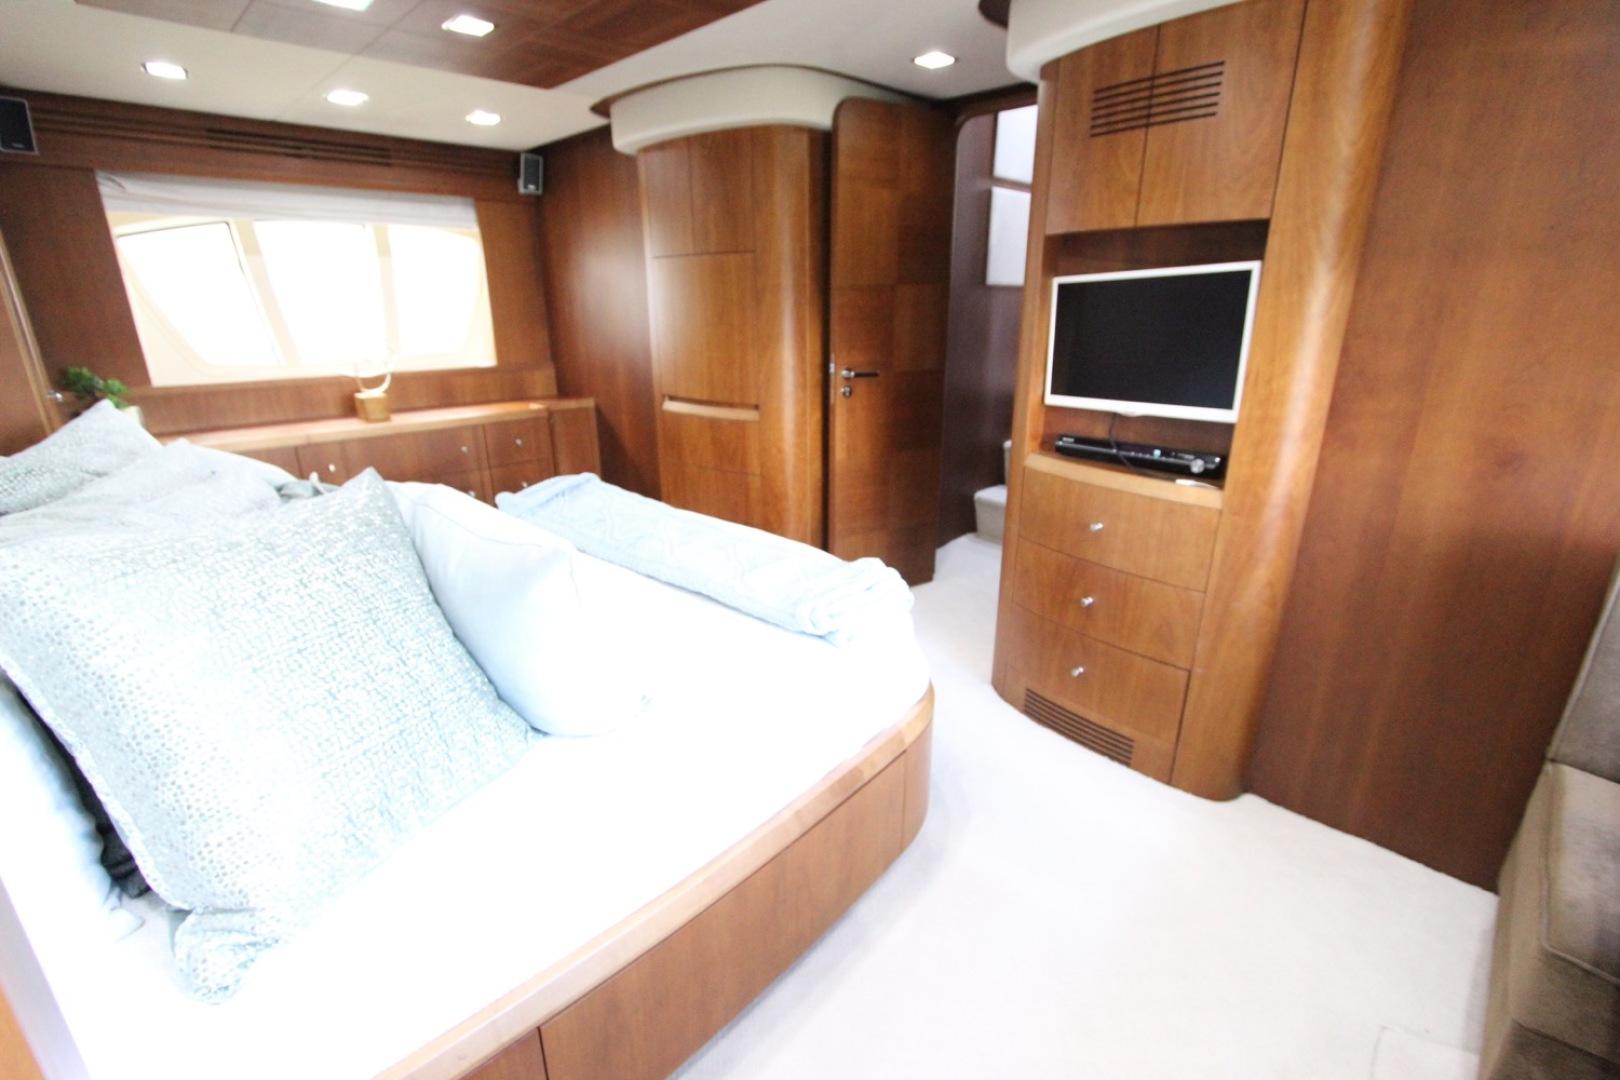 Azimut-2008 Azimut 80 2008-PURA VIDA Aventura-Florida-United States-2008 Azimut 80 Flybride for sale in Aventura -1145135 | Thumbnail